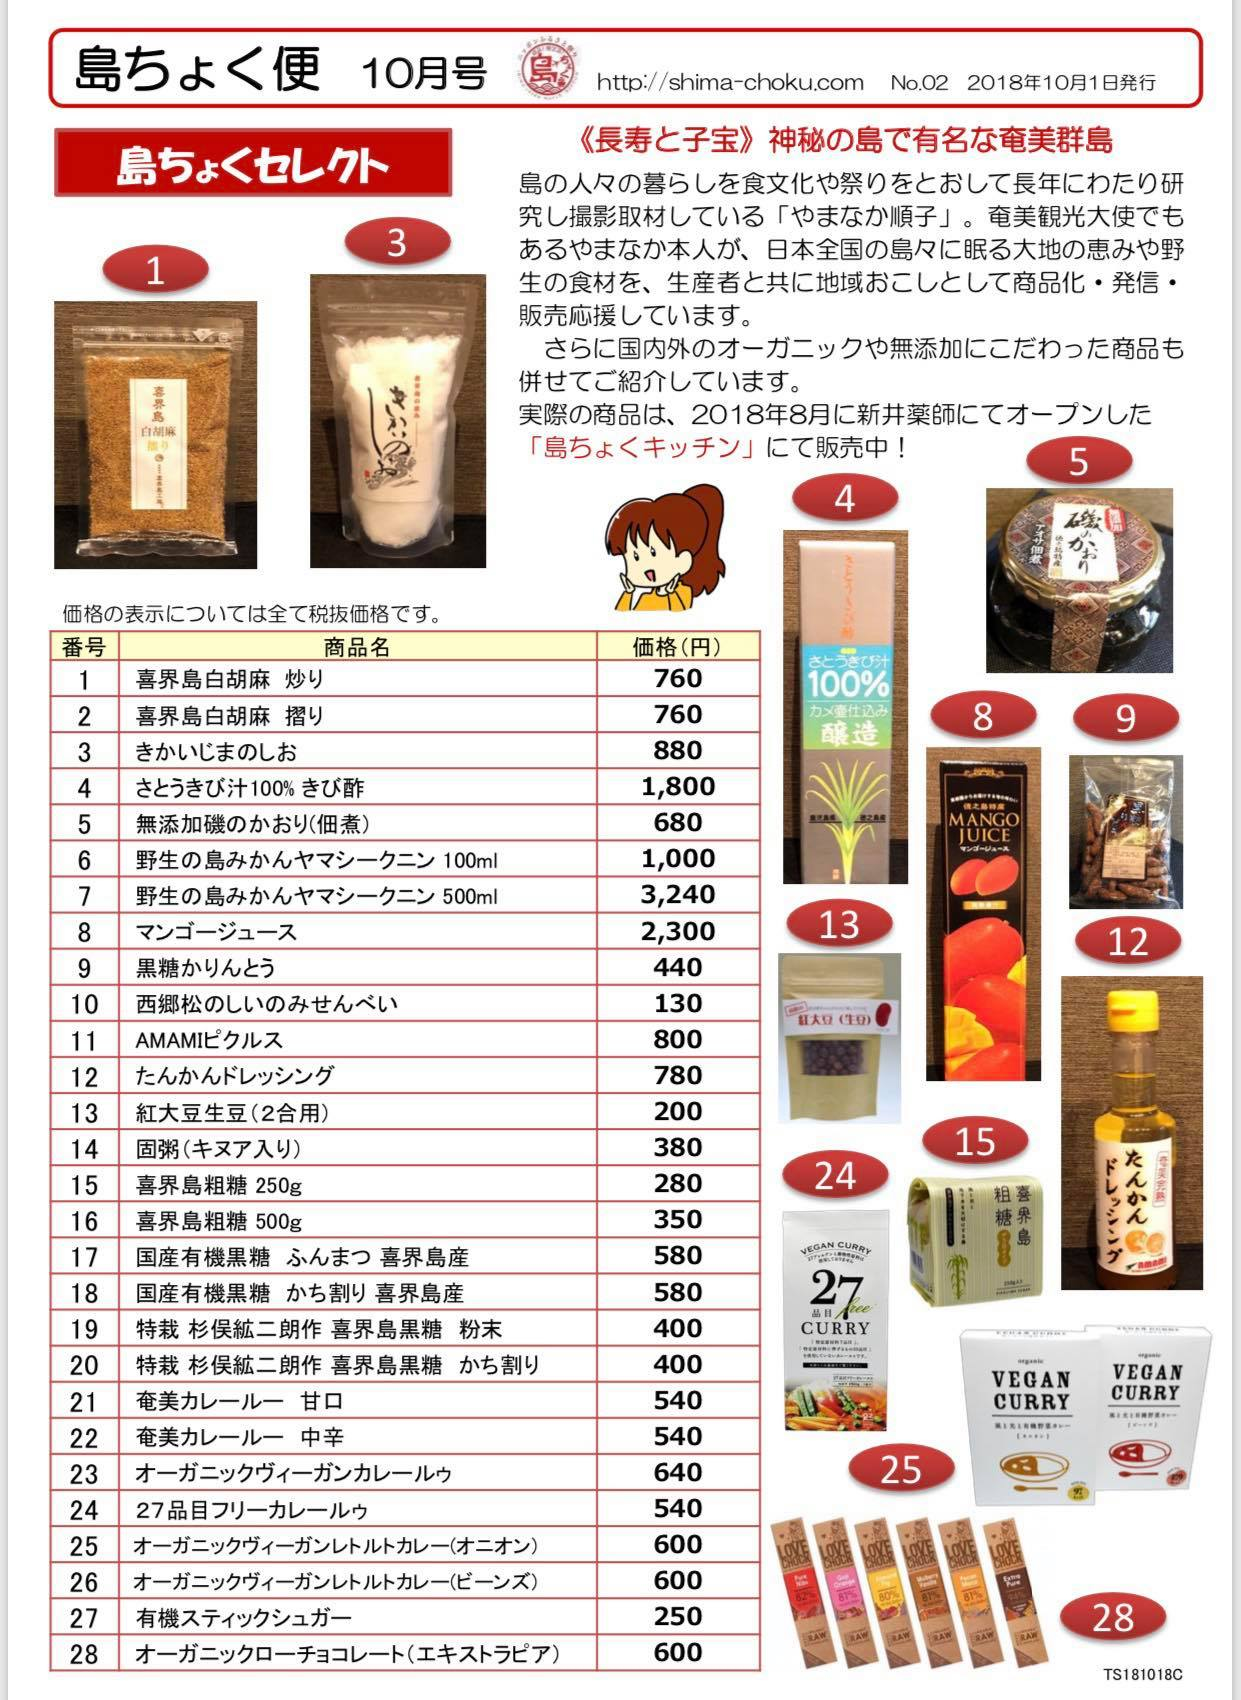 https://shima-choku.com/articles/images/201810b.jpg